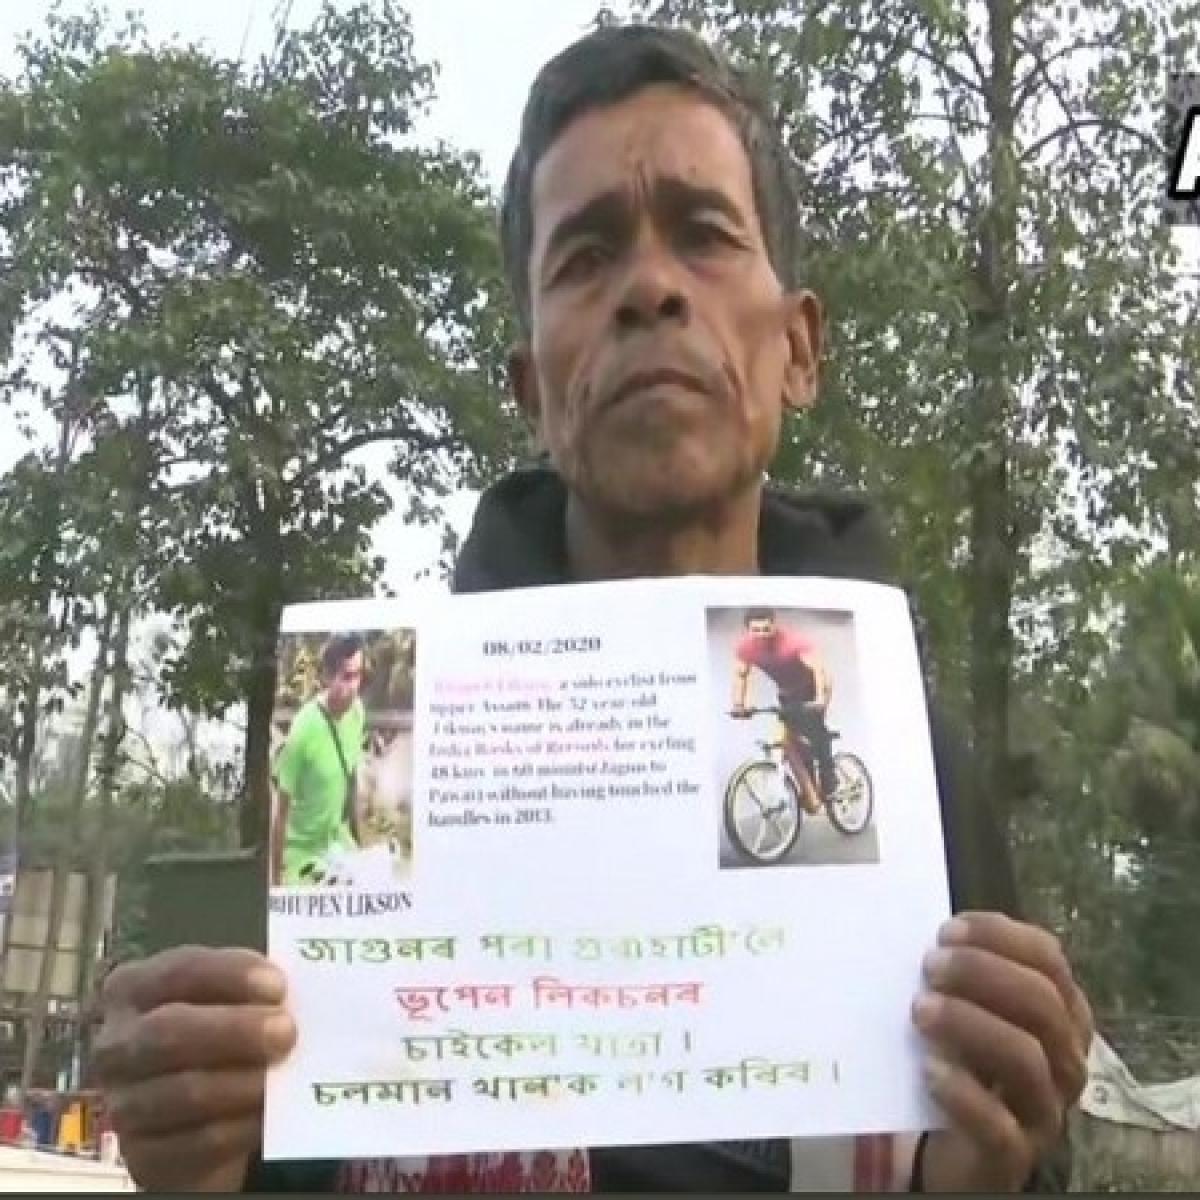 Assam man travels 600 km on cycle to meet Salman Khan!